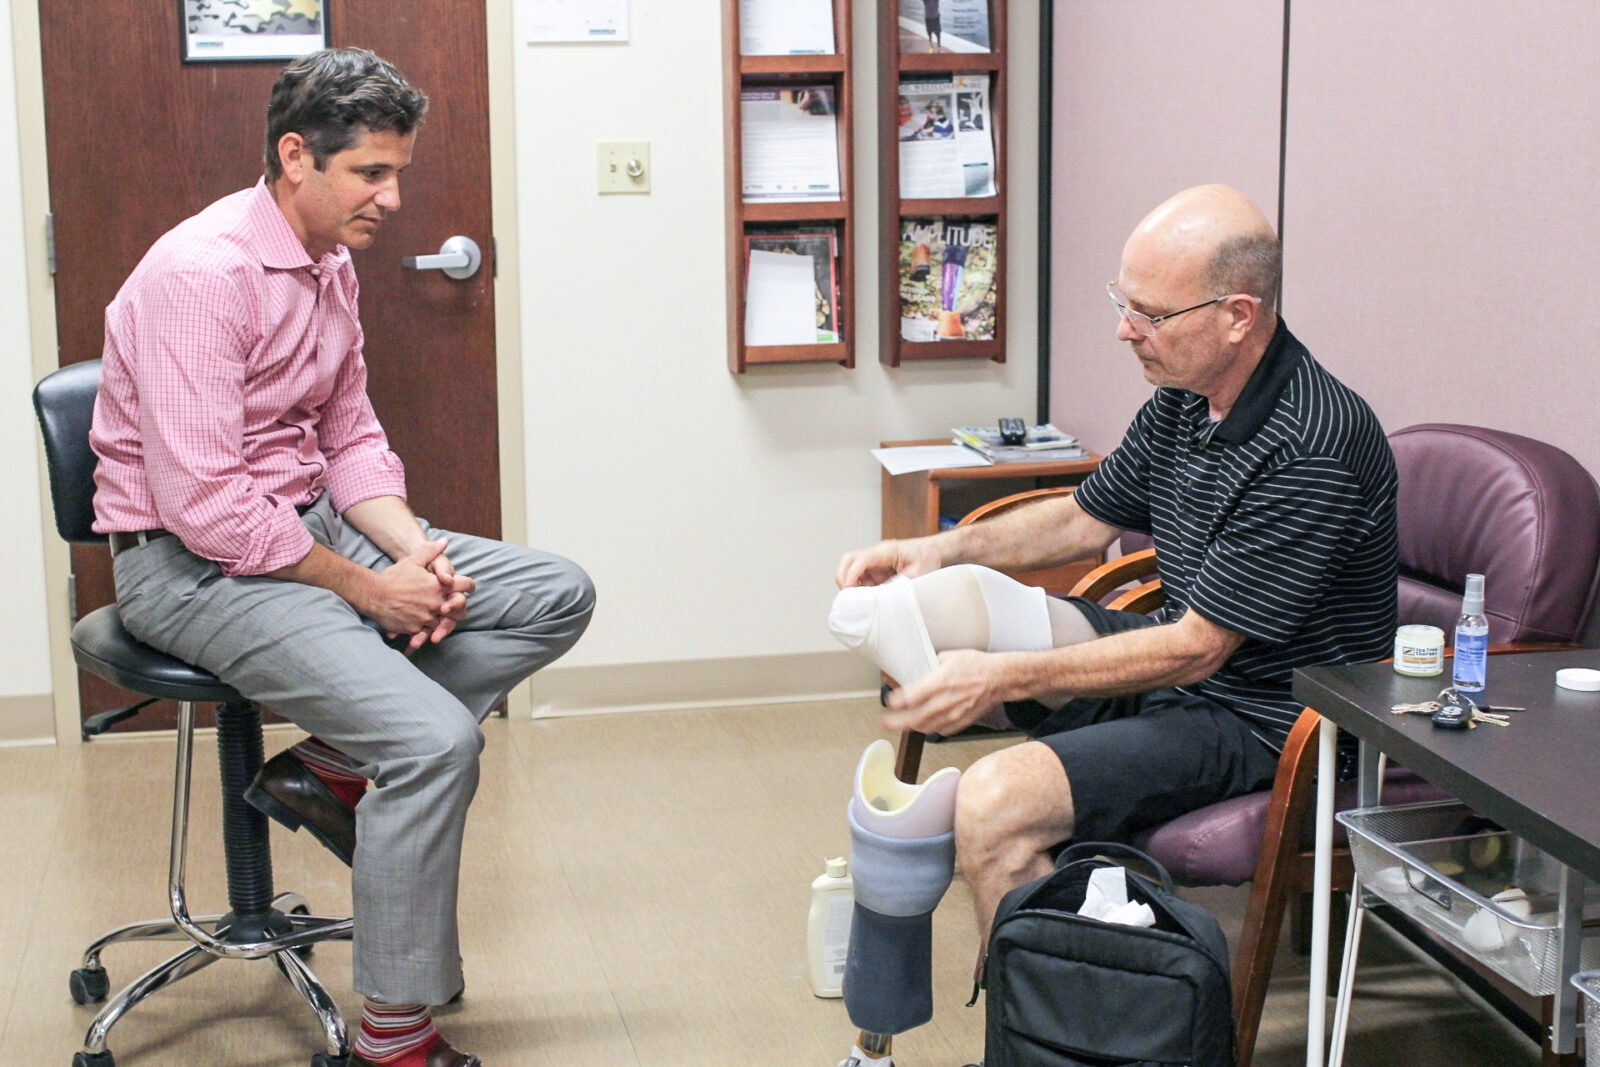 Leg Amputee putting on Prosthetic Leg with prosthetist